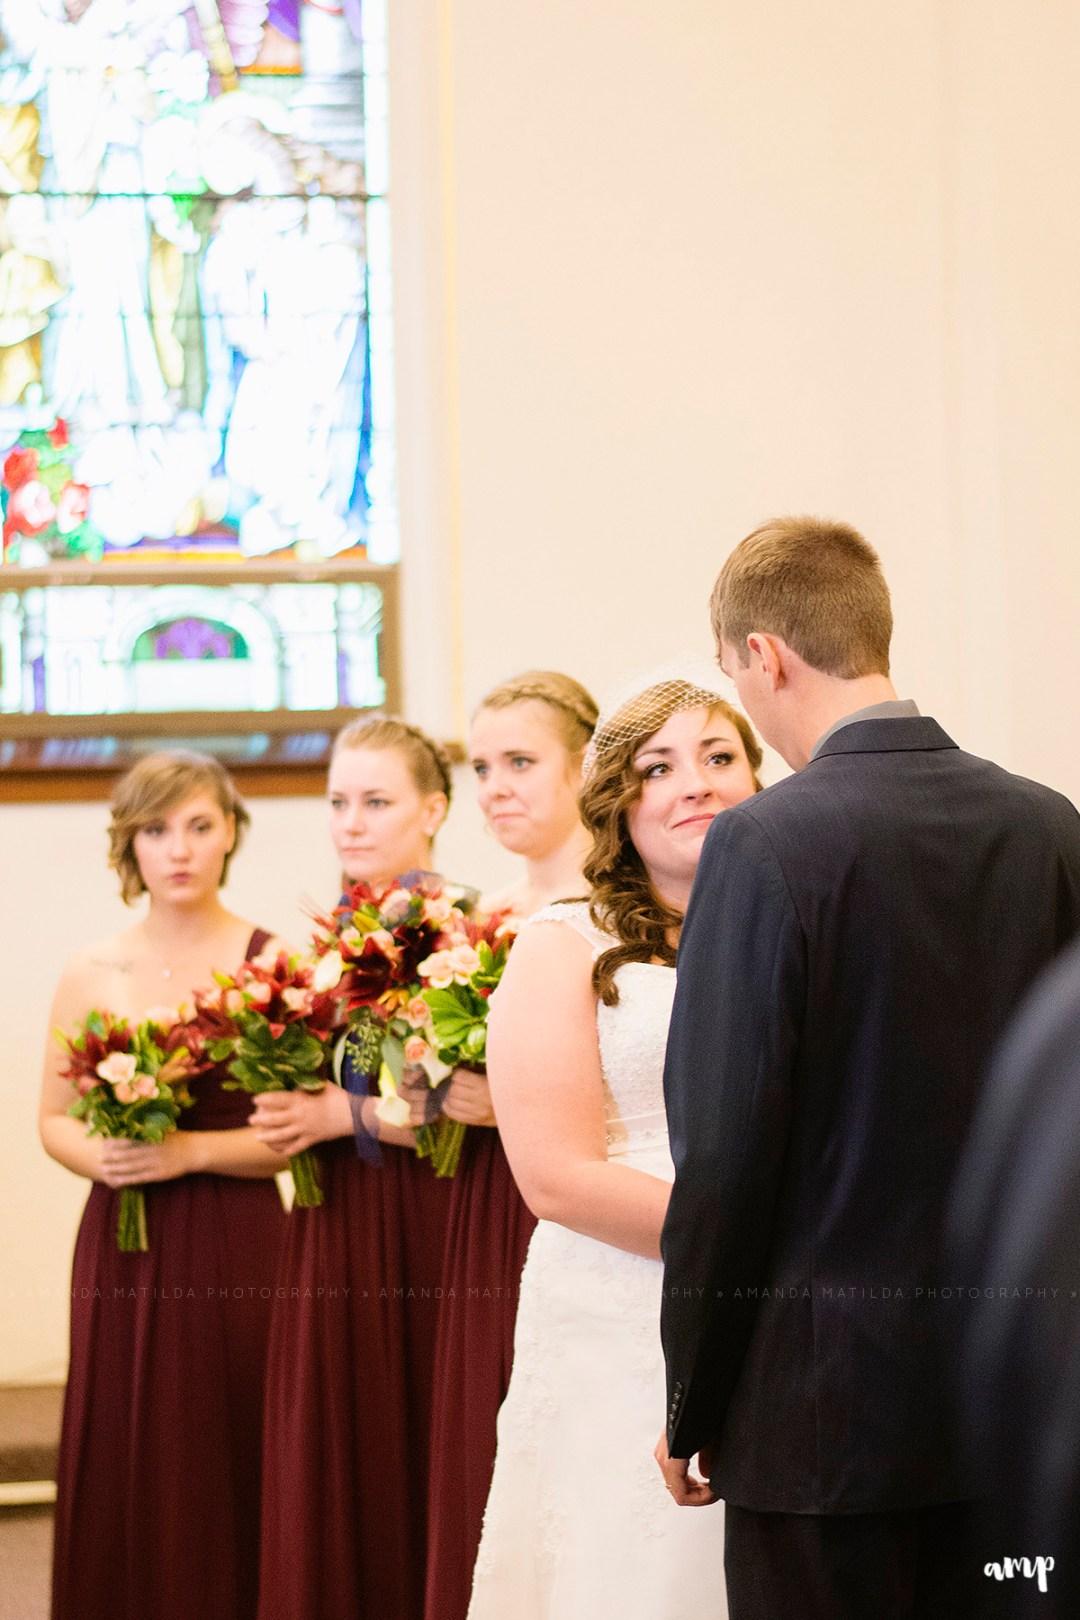 Bride & Groom in Sanctuary | Grand Junction Wedding Photographer